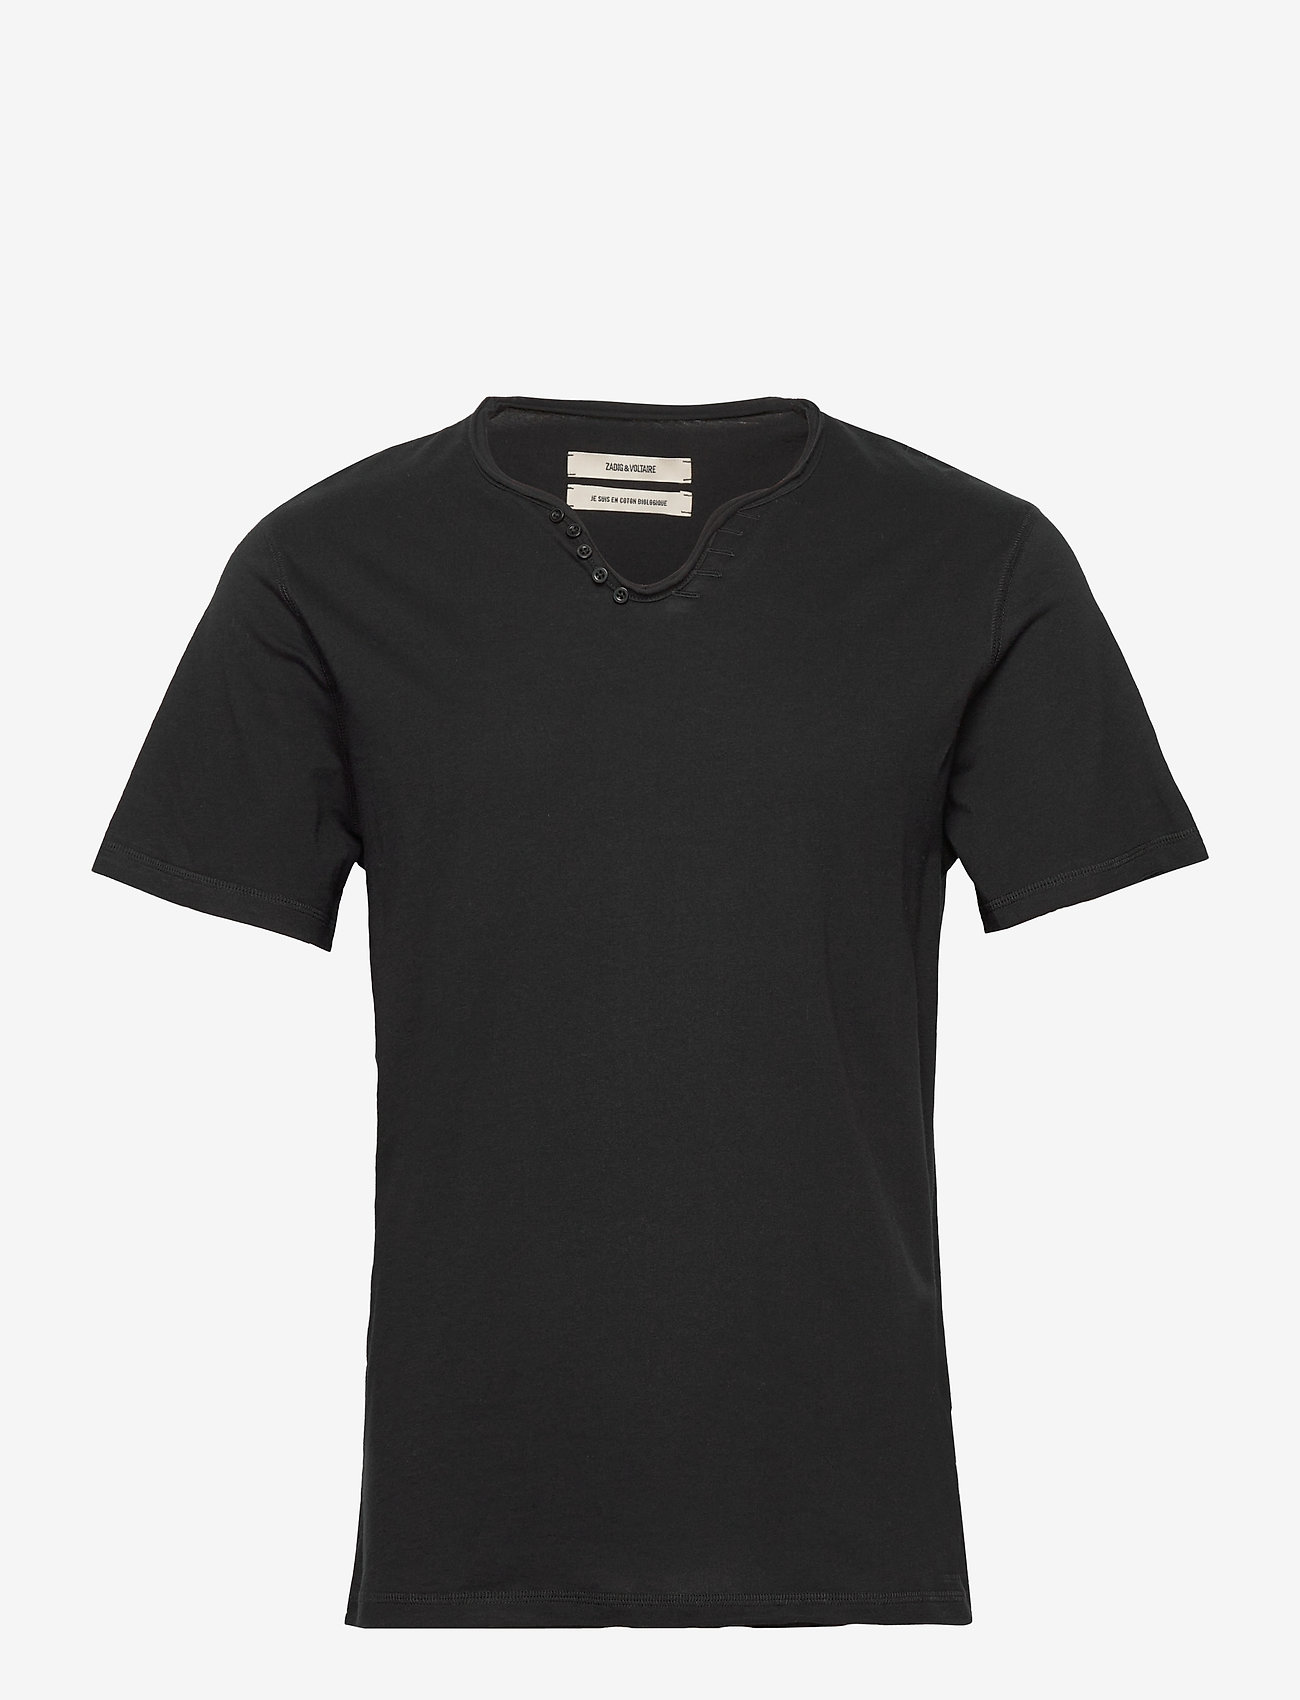 Zadig & Voltaire - MONASTIR MC ECO TUNISIEN MC ECOFRIENDLY - basic t-shirts - black - 0